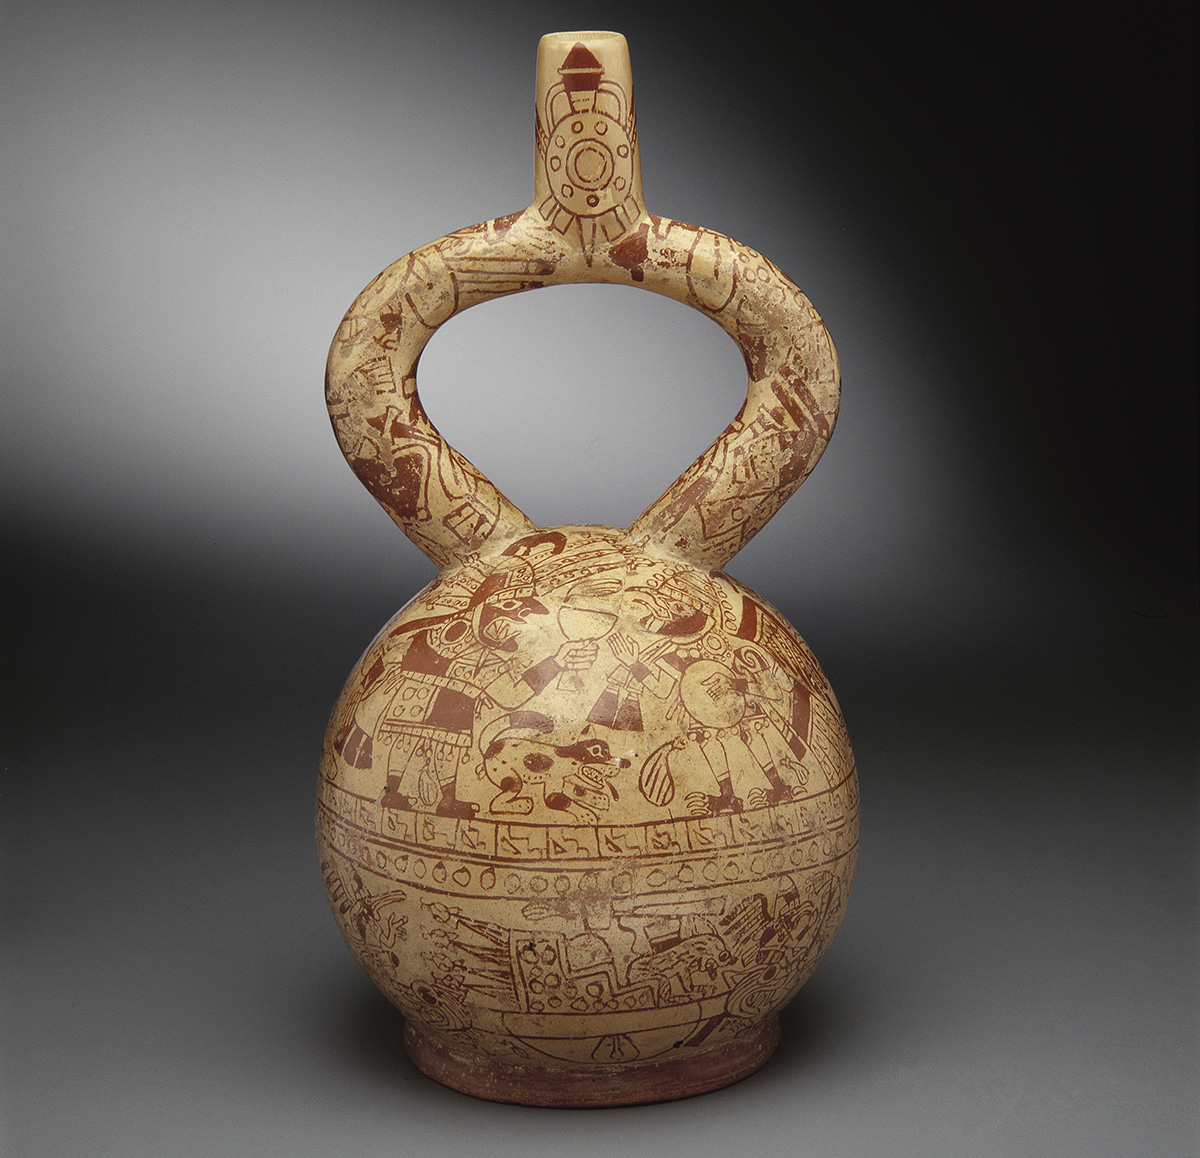 Moche Art in Barcelona: Gold, Myths and Rituals of Ancient Peru, Aracari Travel